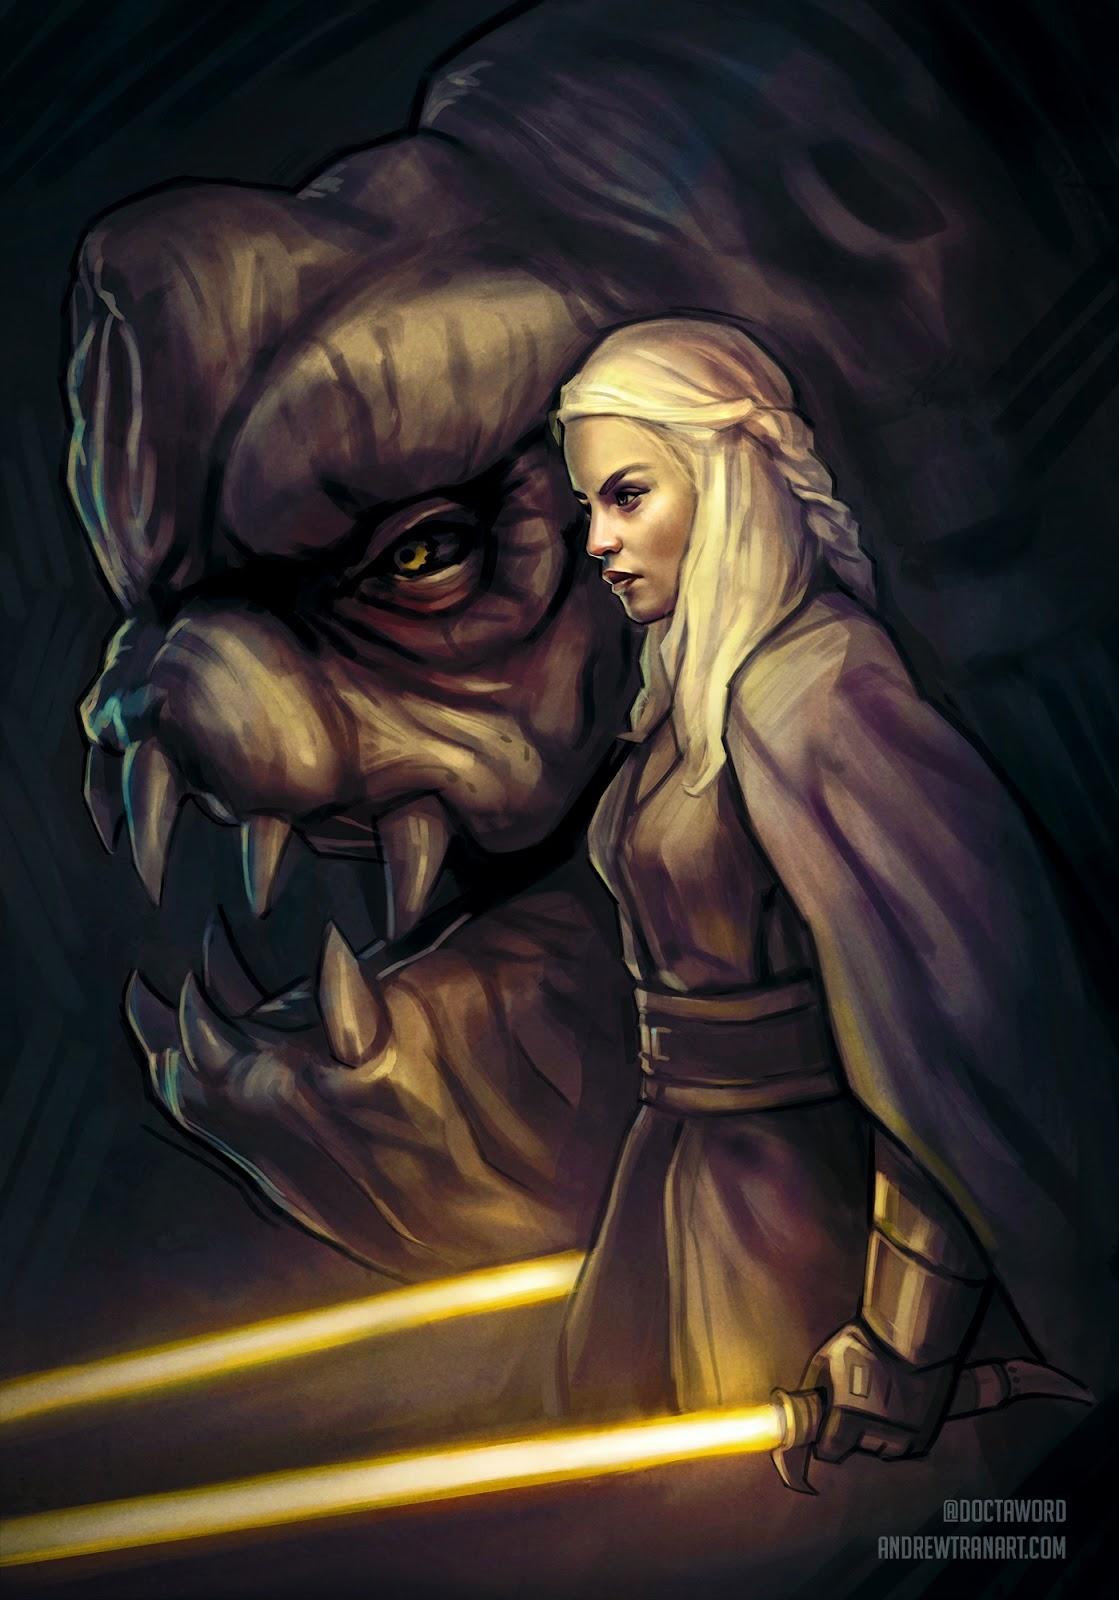 01-Daenerys-Targaryen-Emilia-Clarke-Andrew-D-Tran-Doctaword-Star-Wars-and-Game-of-Thrones-Mashup-www-designstack-co